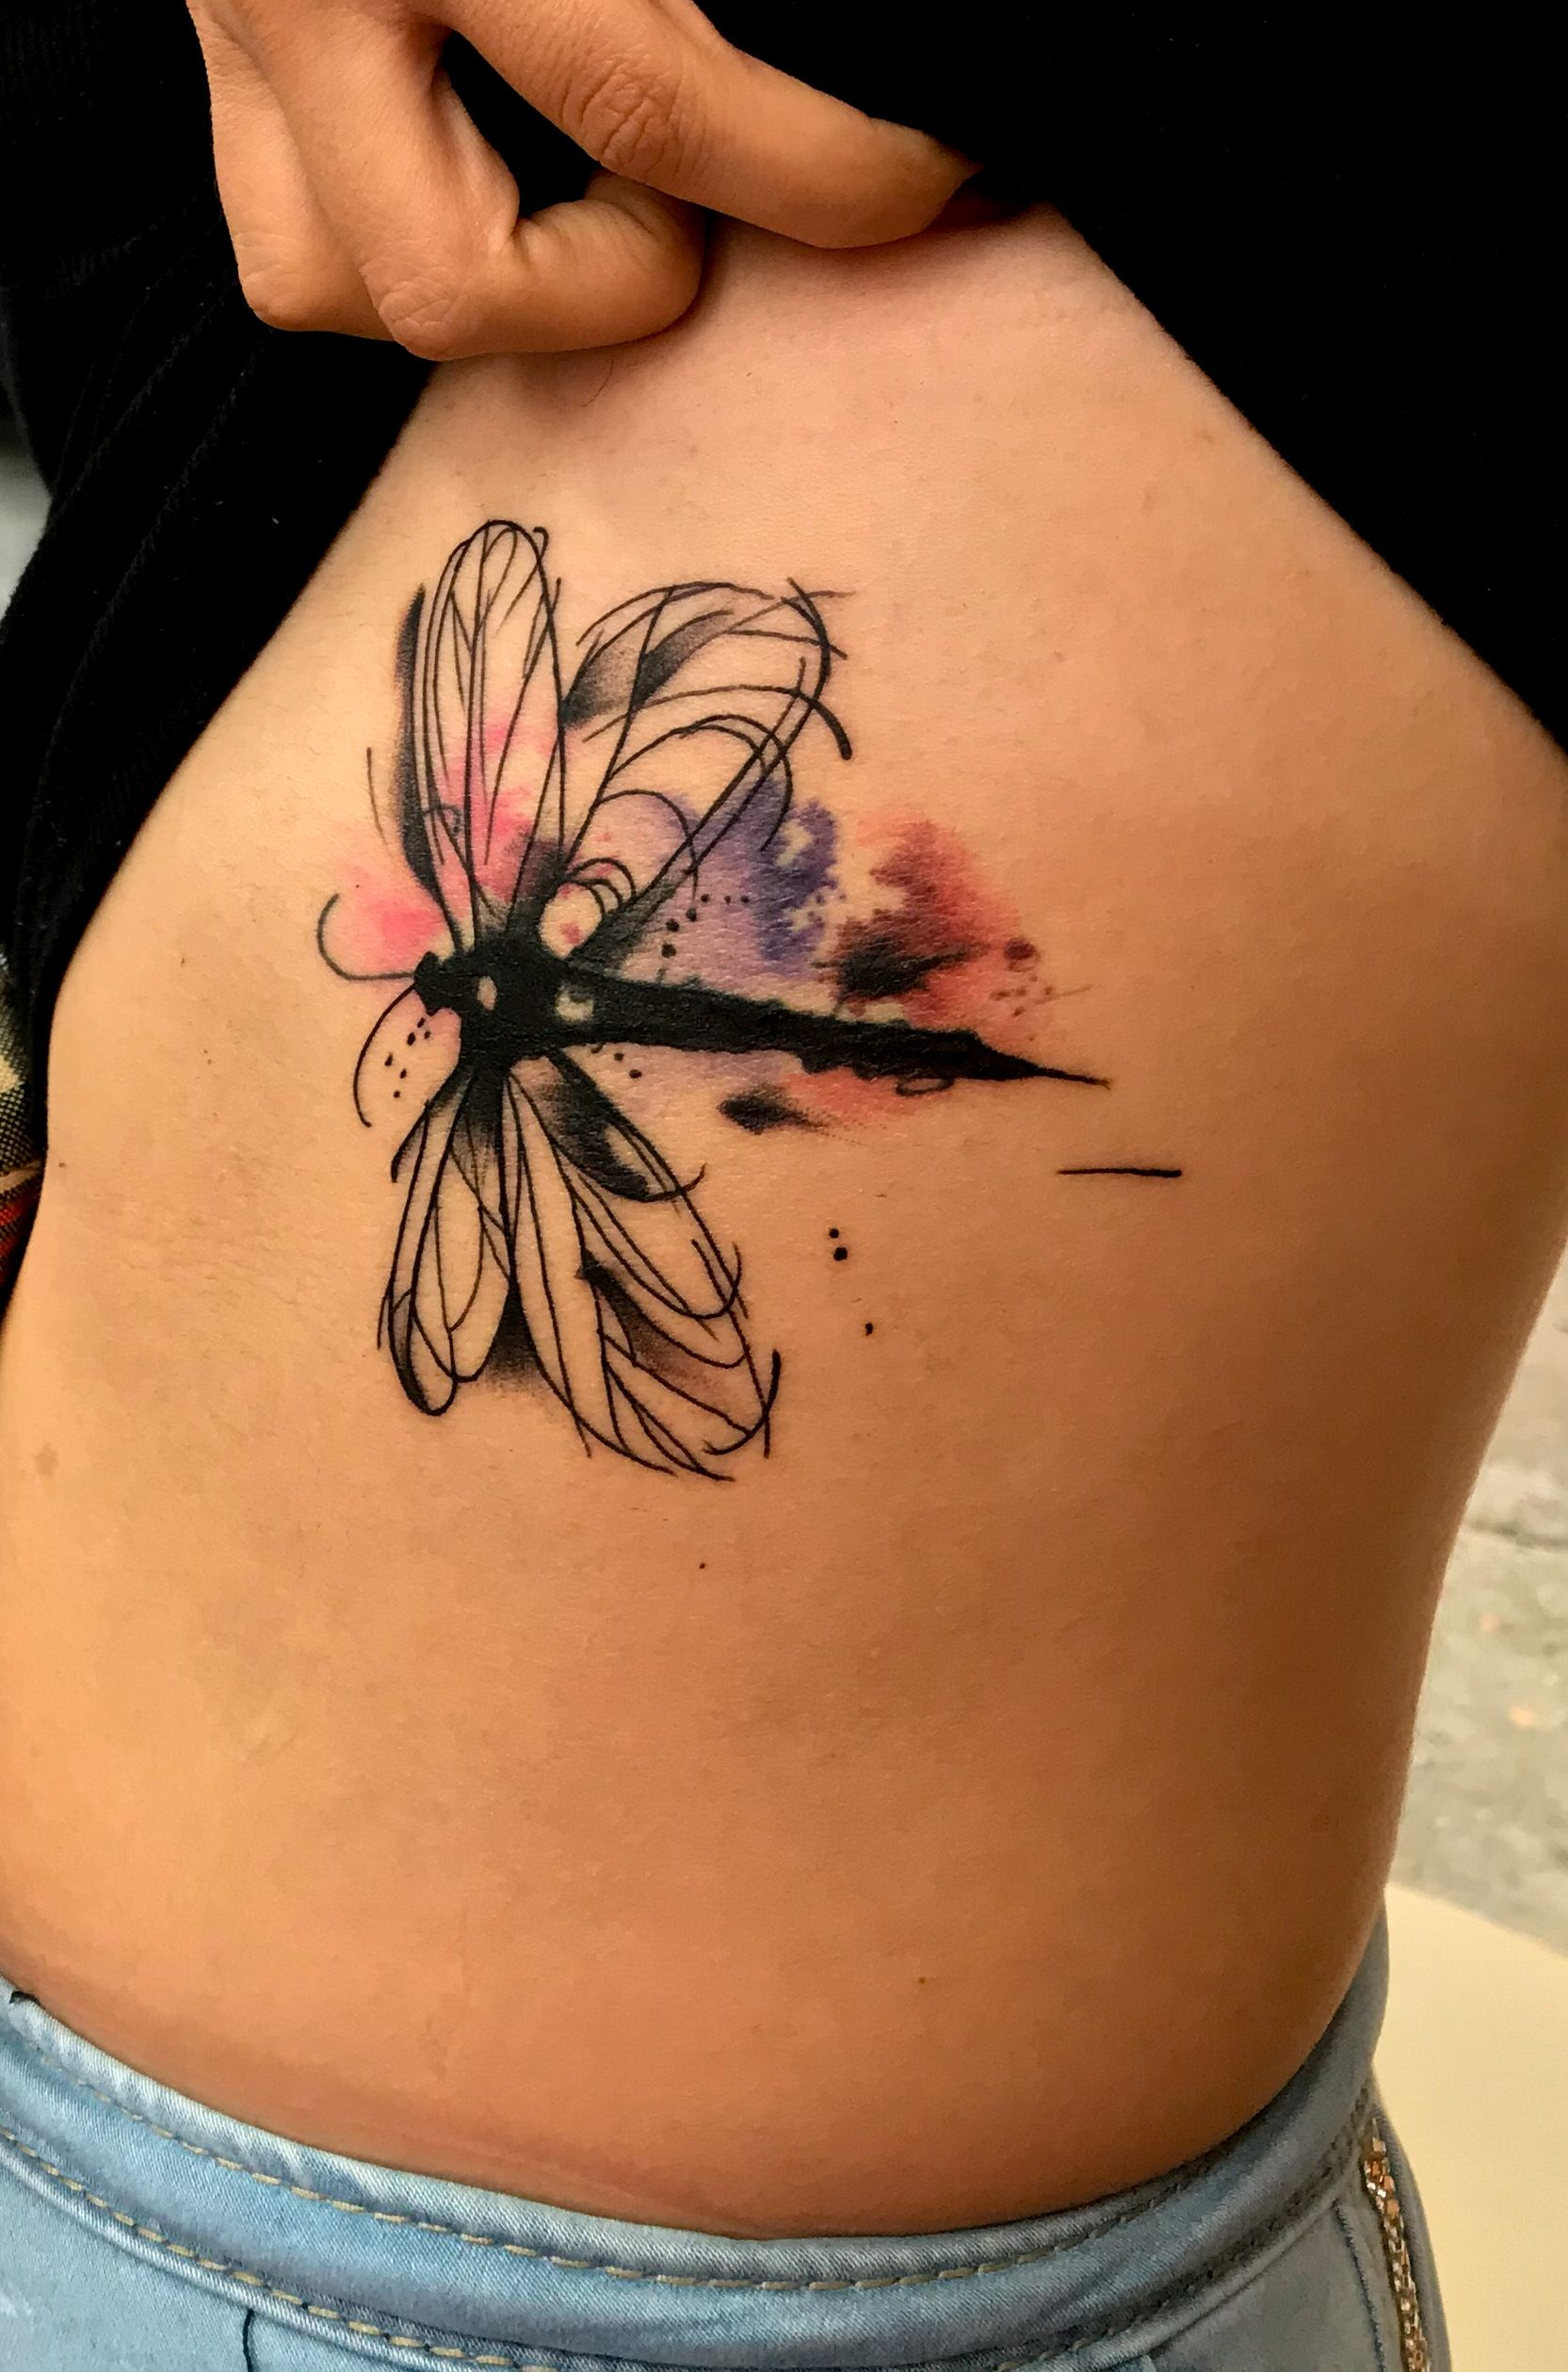 Dragonfly tattoo acuarela tattoos tattooartist dragonfly